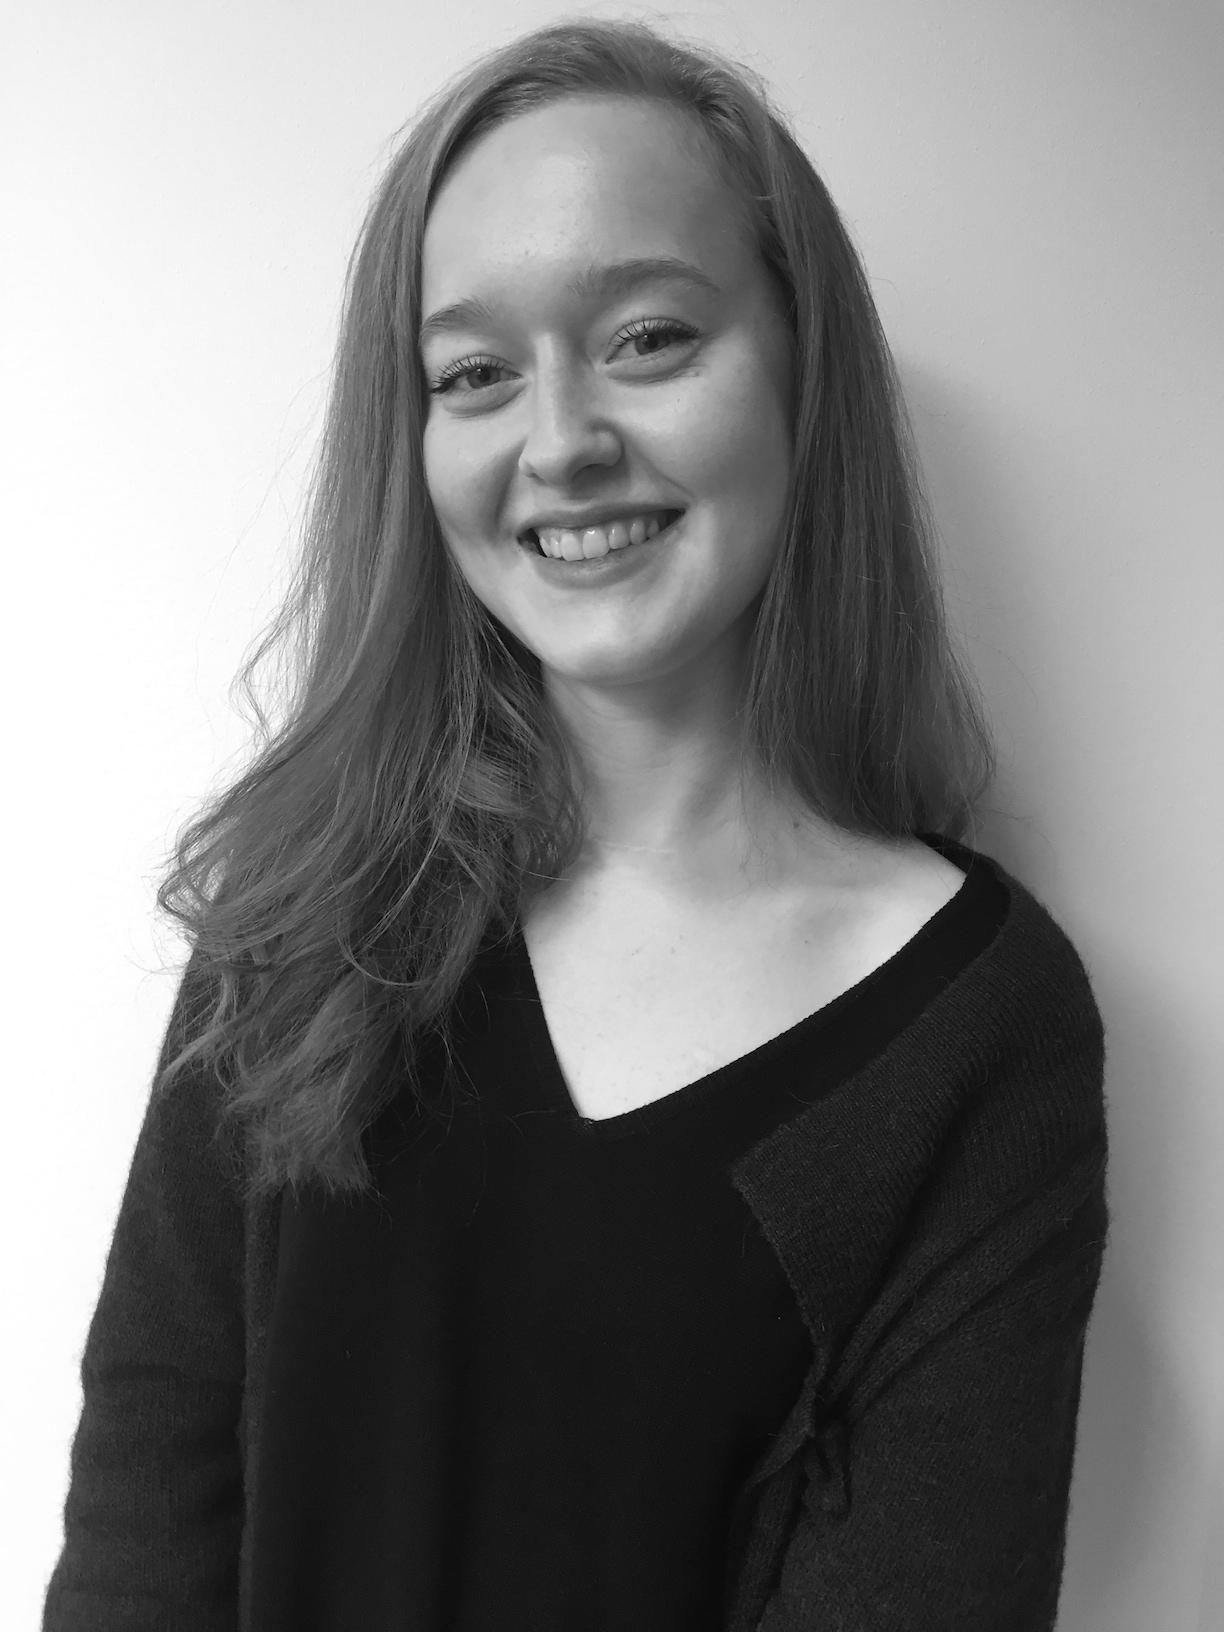 Lisa Rutgersson